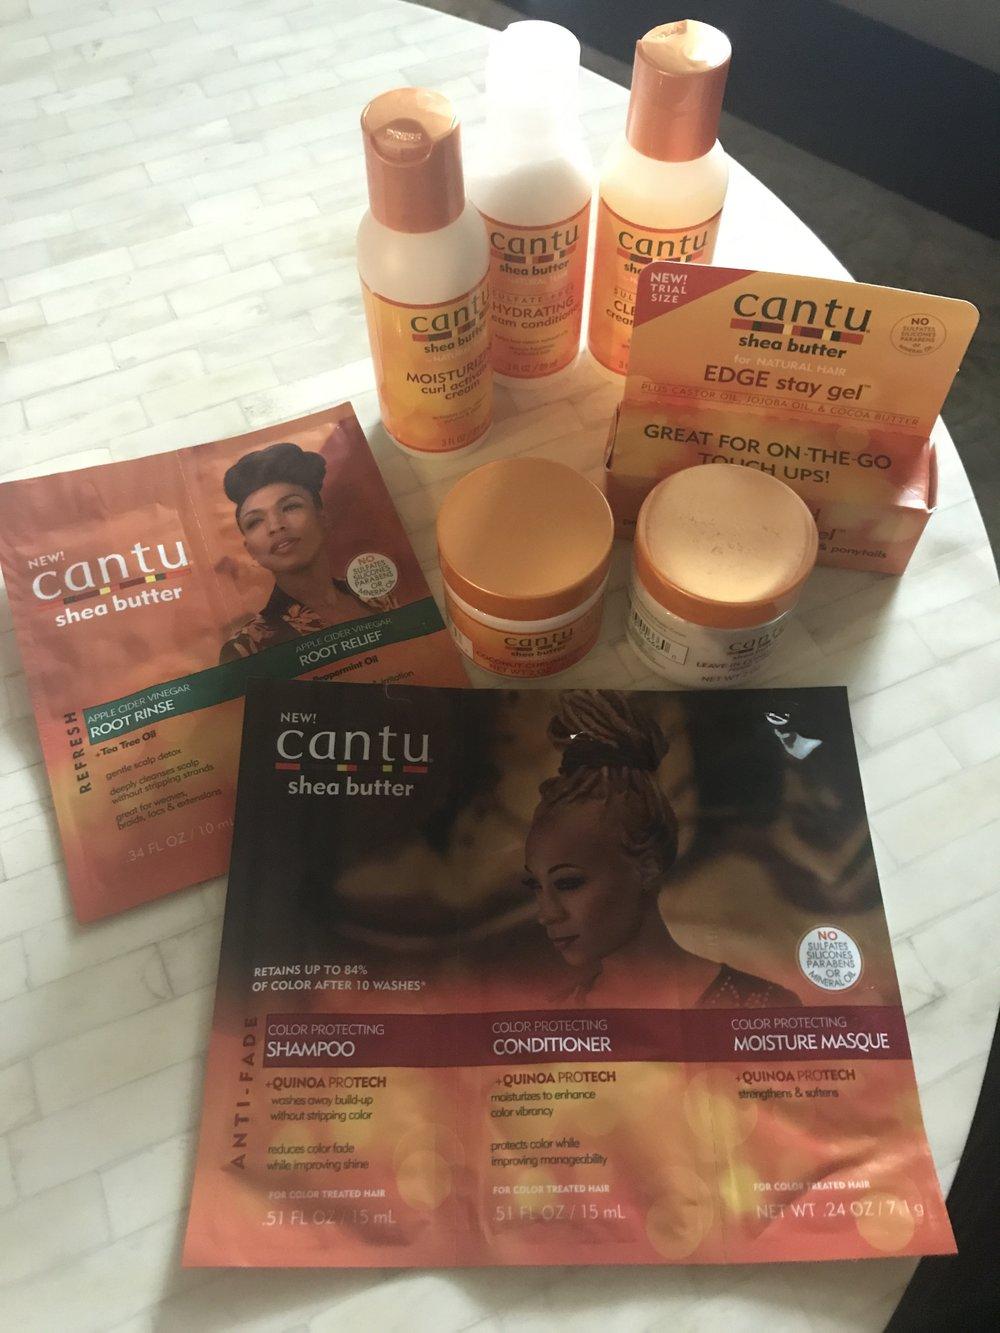 Cantu Shea Butter Hair Care Samples